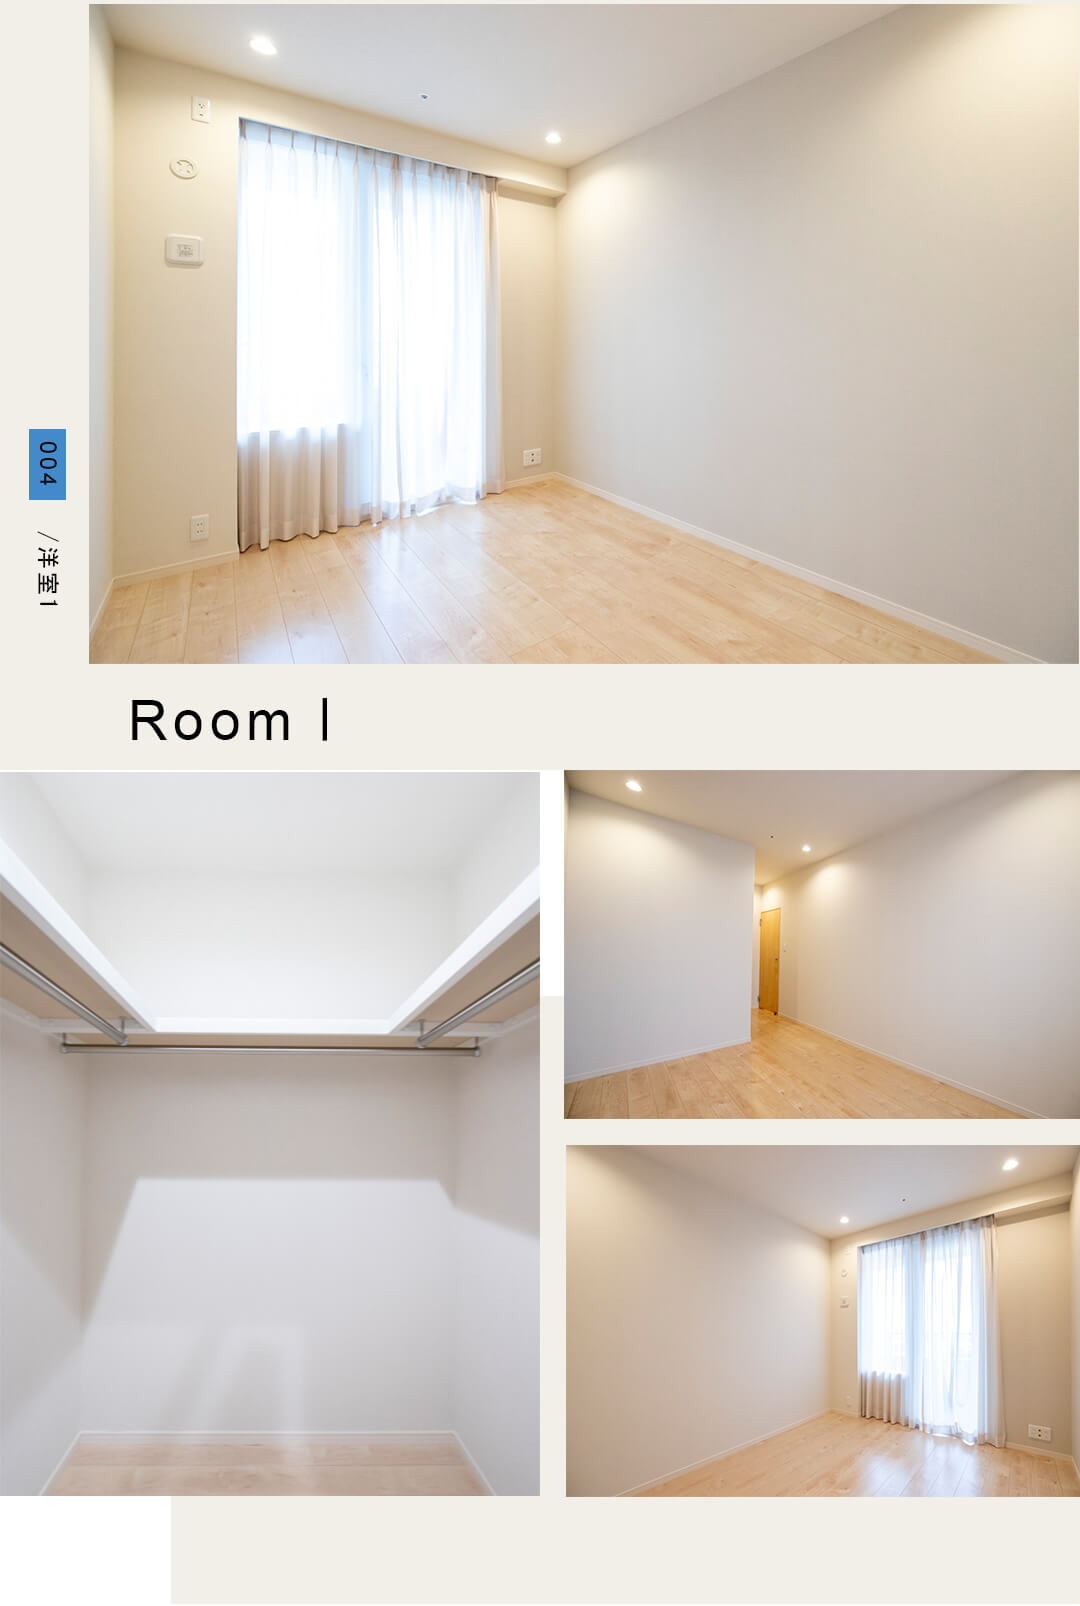 004,room1,洋室1